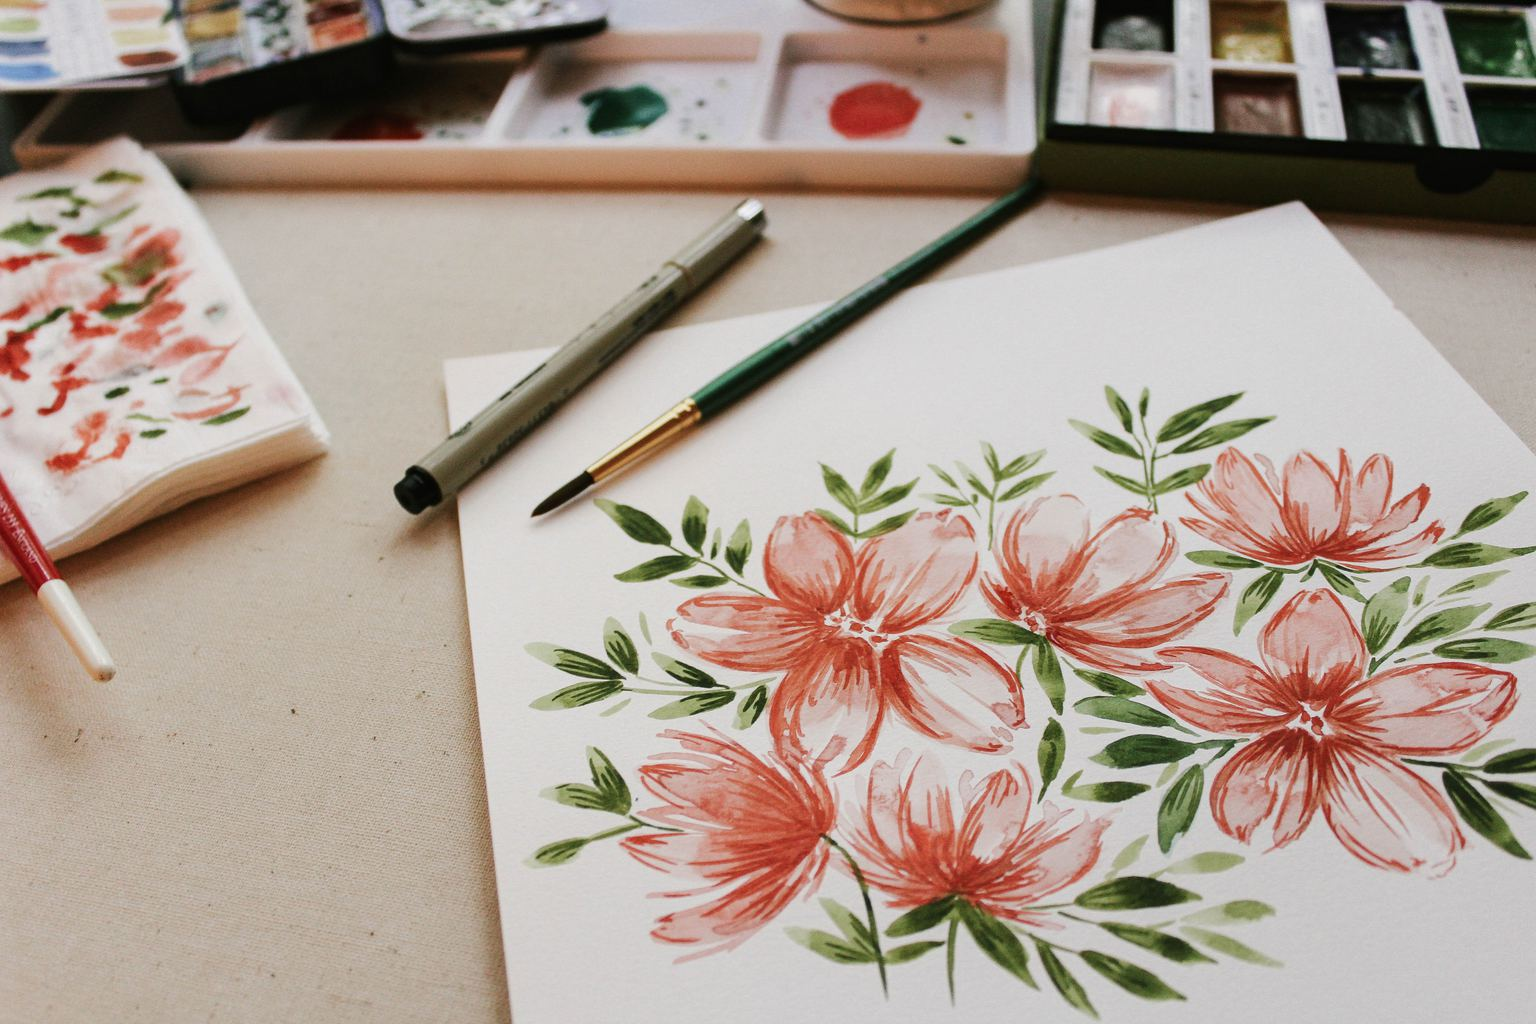 painting, art, diy, flowers, paint